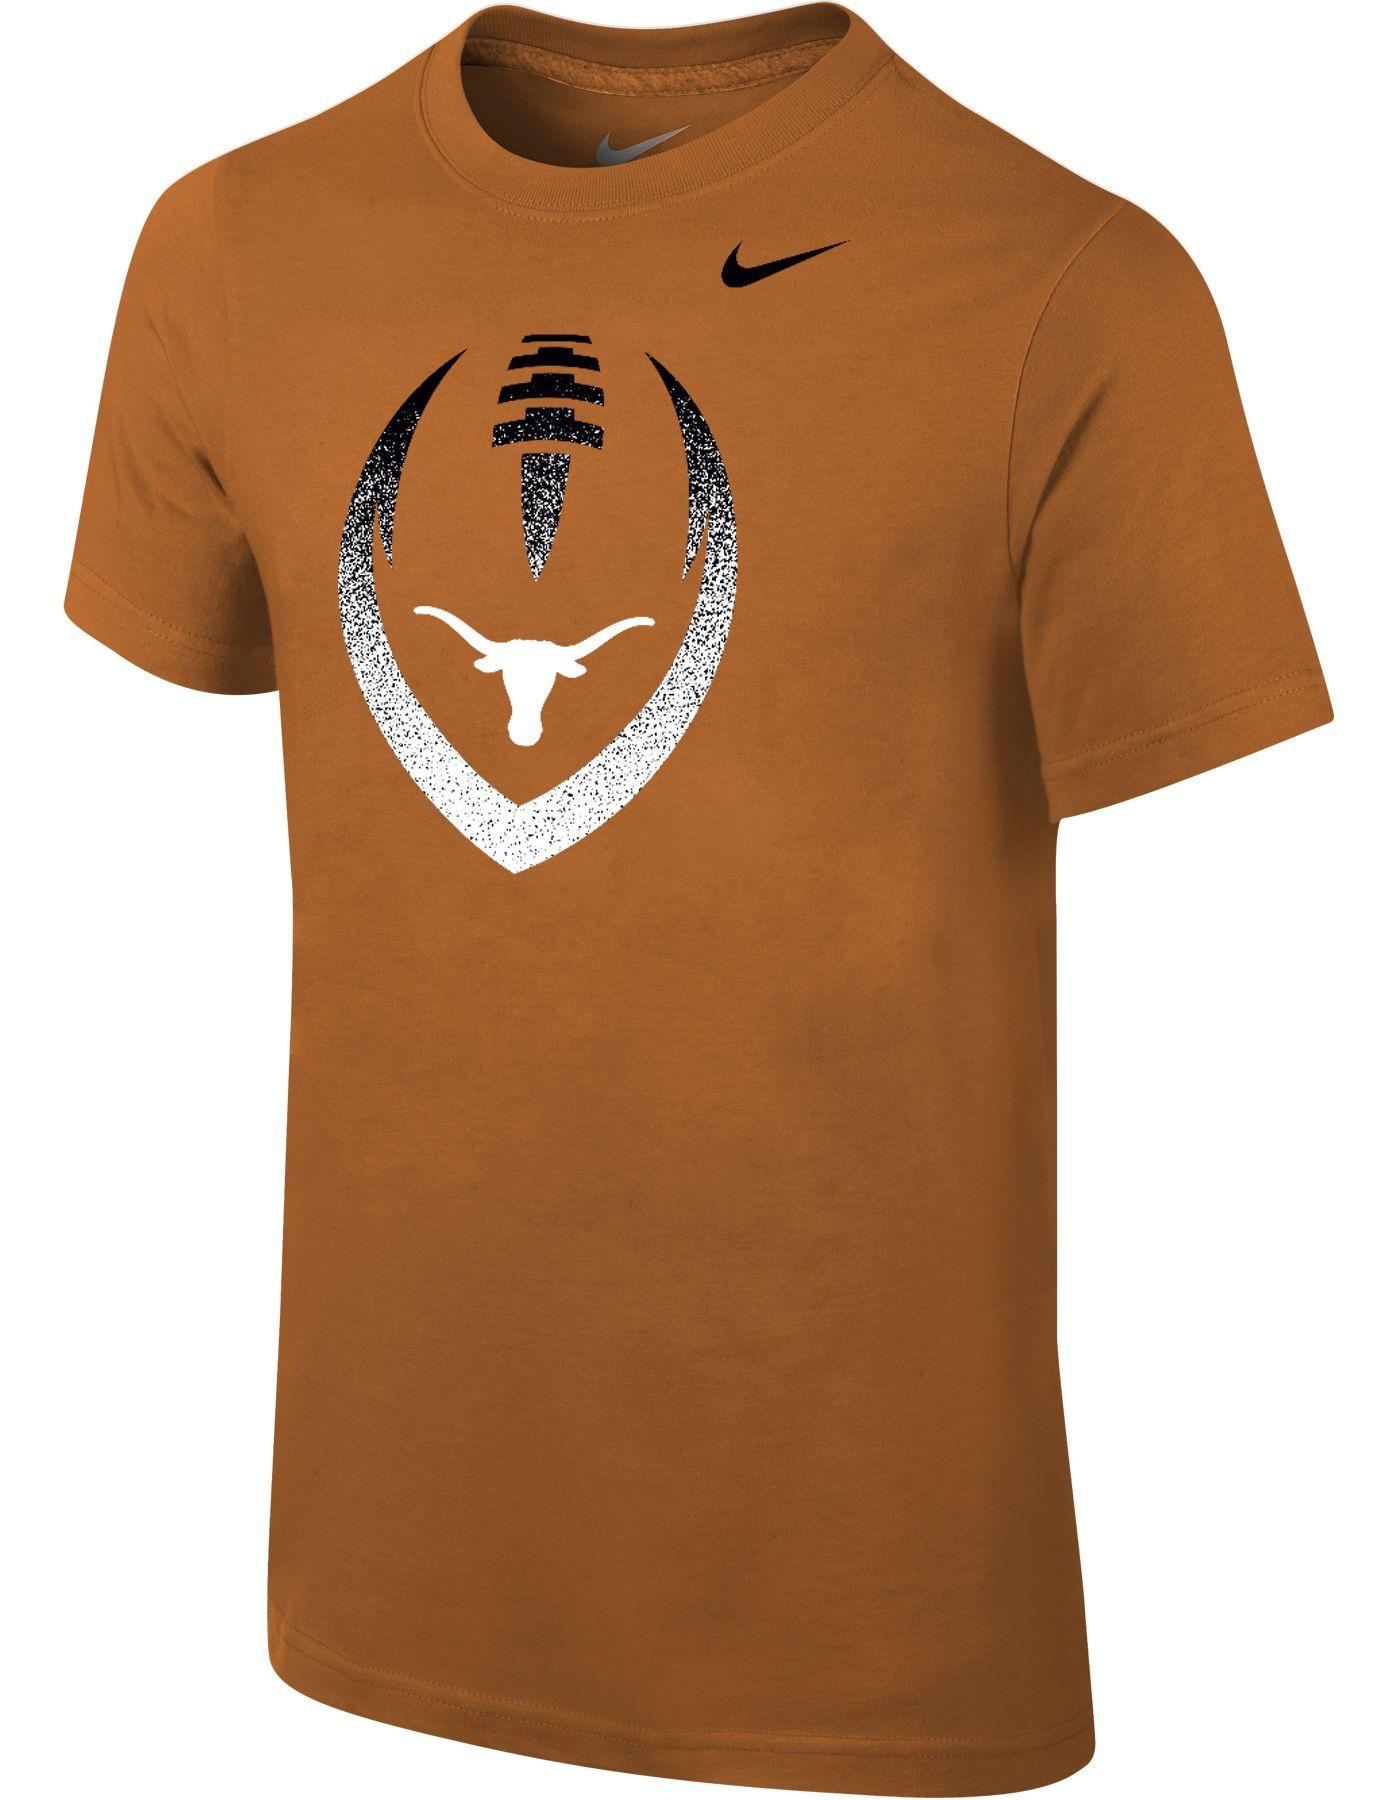 Nike Youth Texas Longhorns Burnt Orange Cotton Football Icon T-Shirt